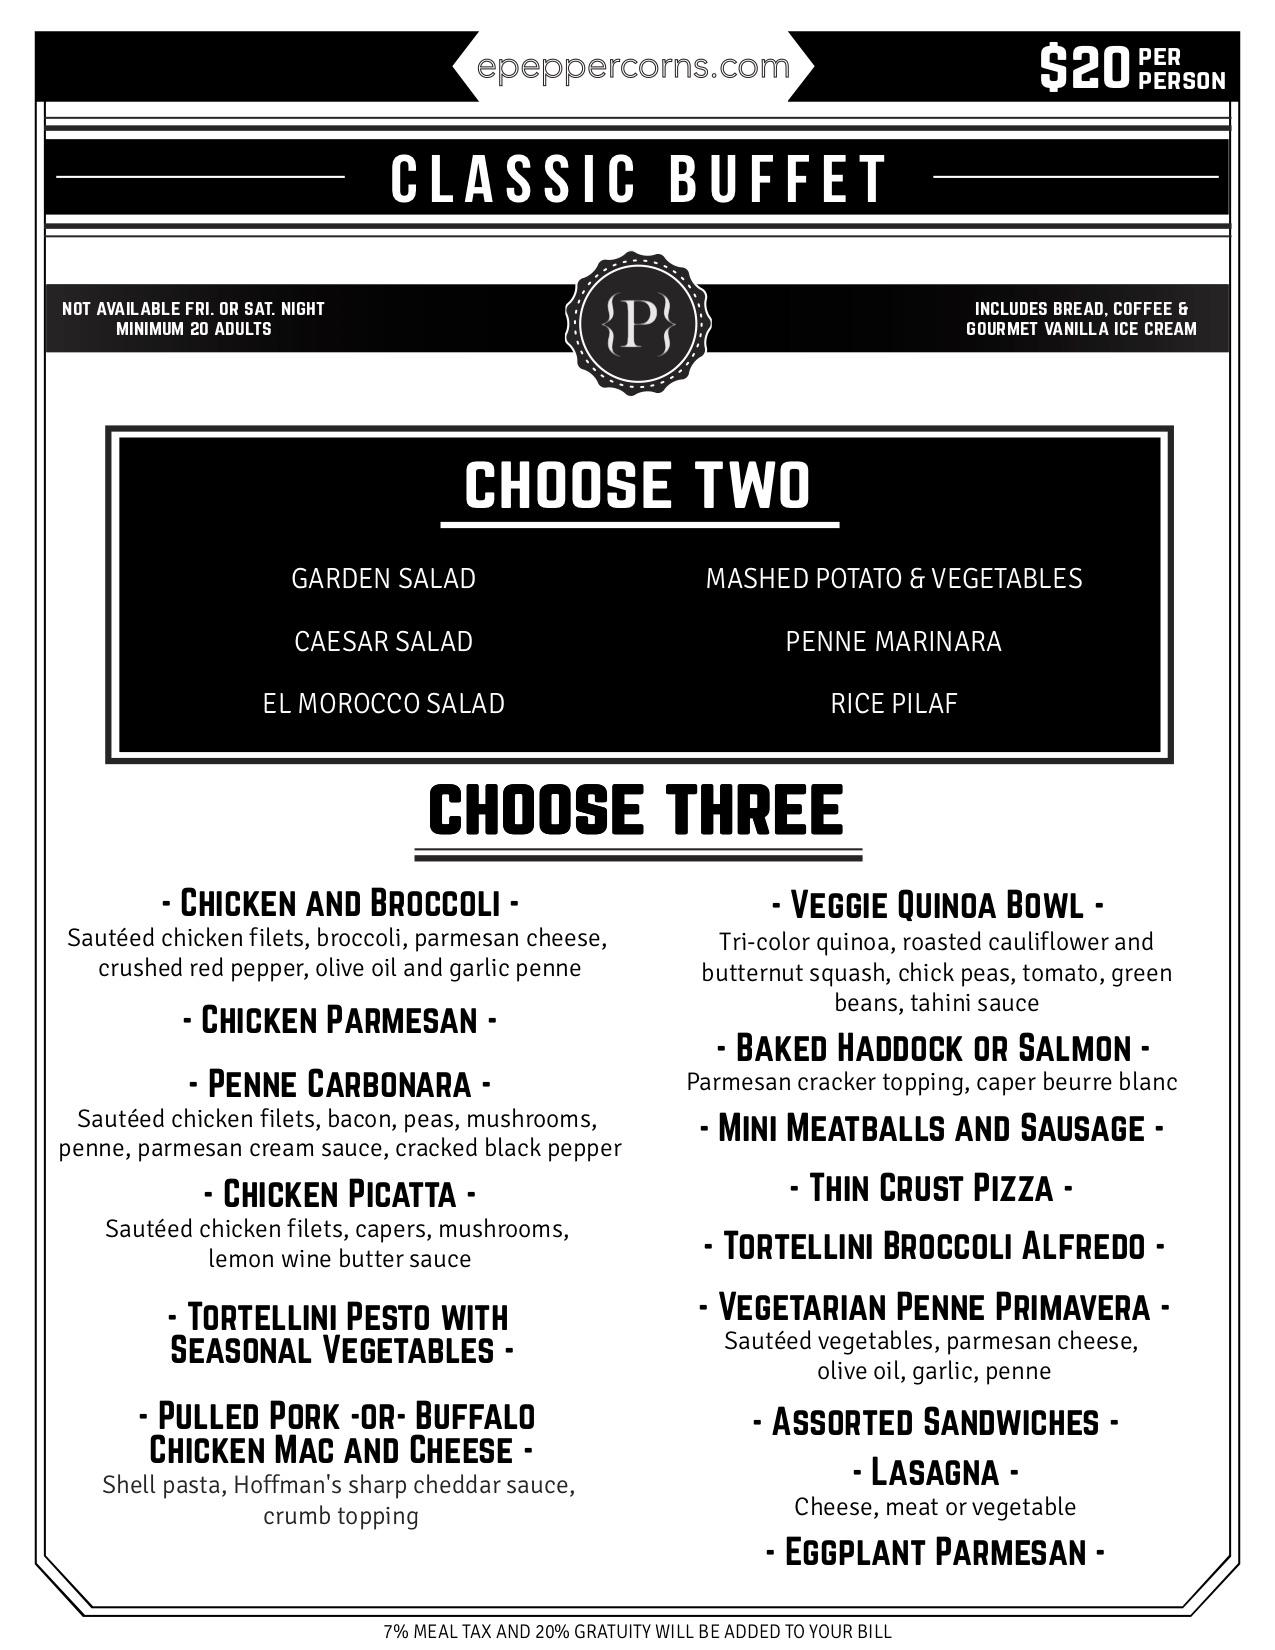 downloadable menu - classic buffet